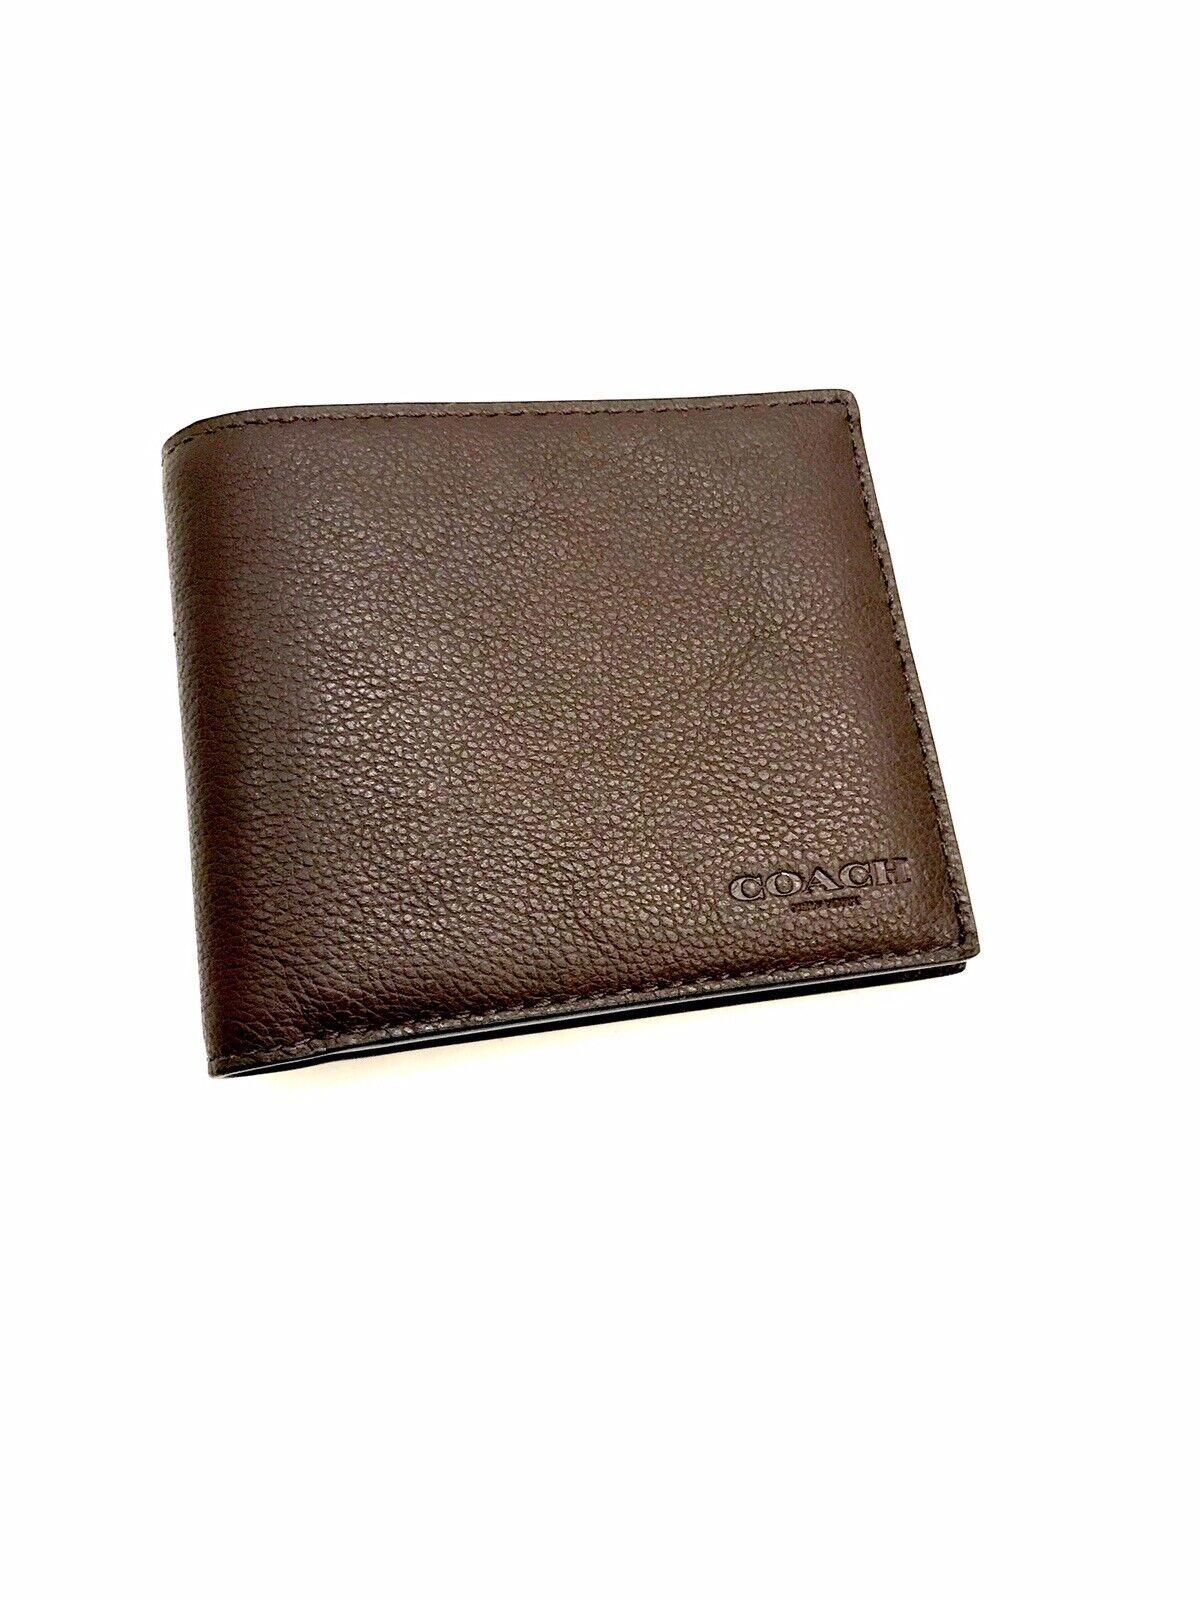 COACH New York Men's Luxury Pebble Grain Leather Bi Fold Brown Wallet NWOT